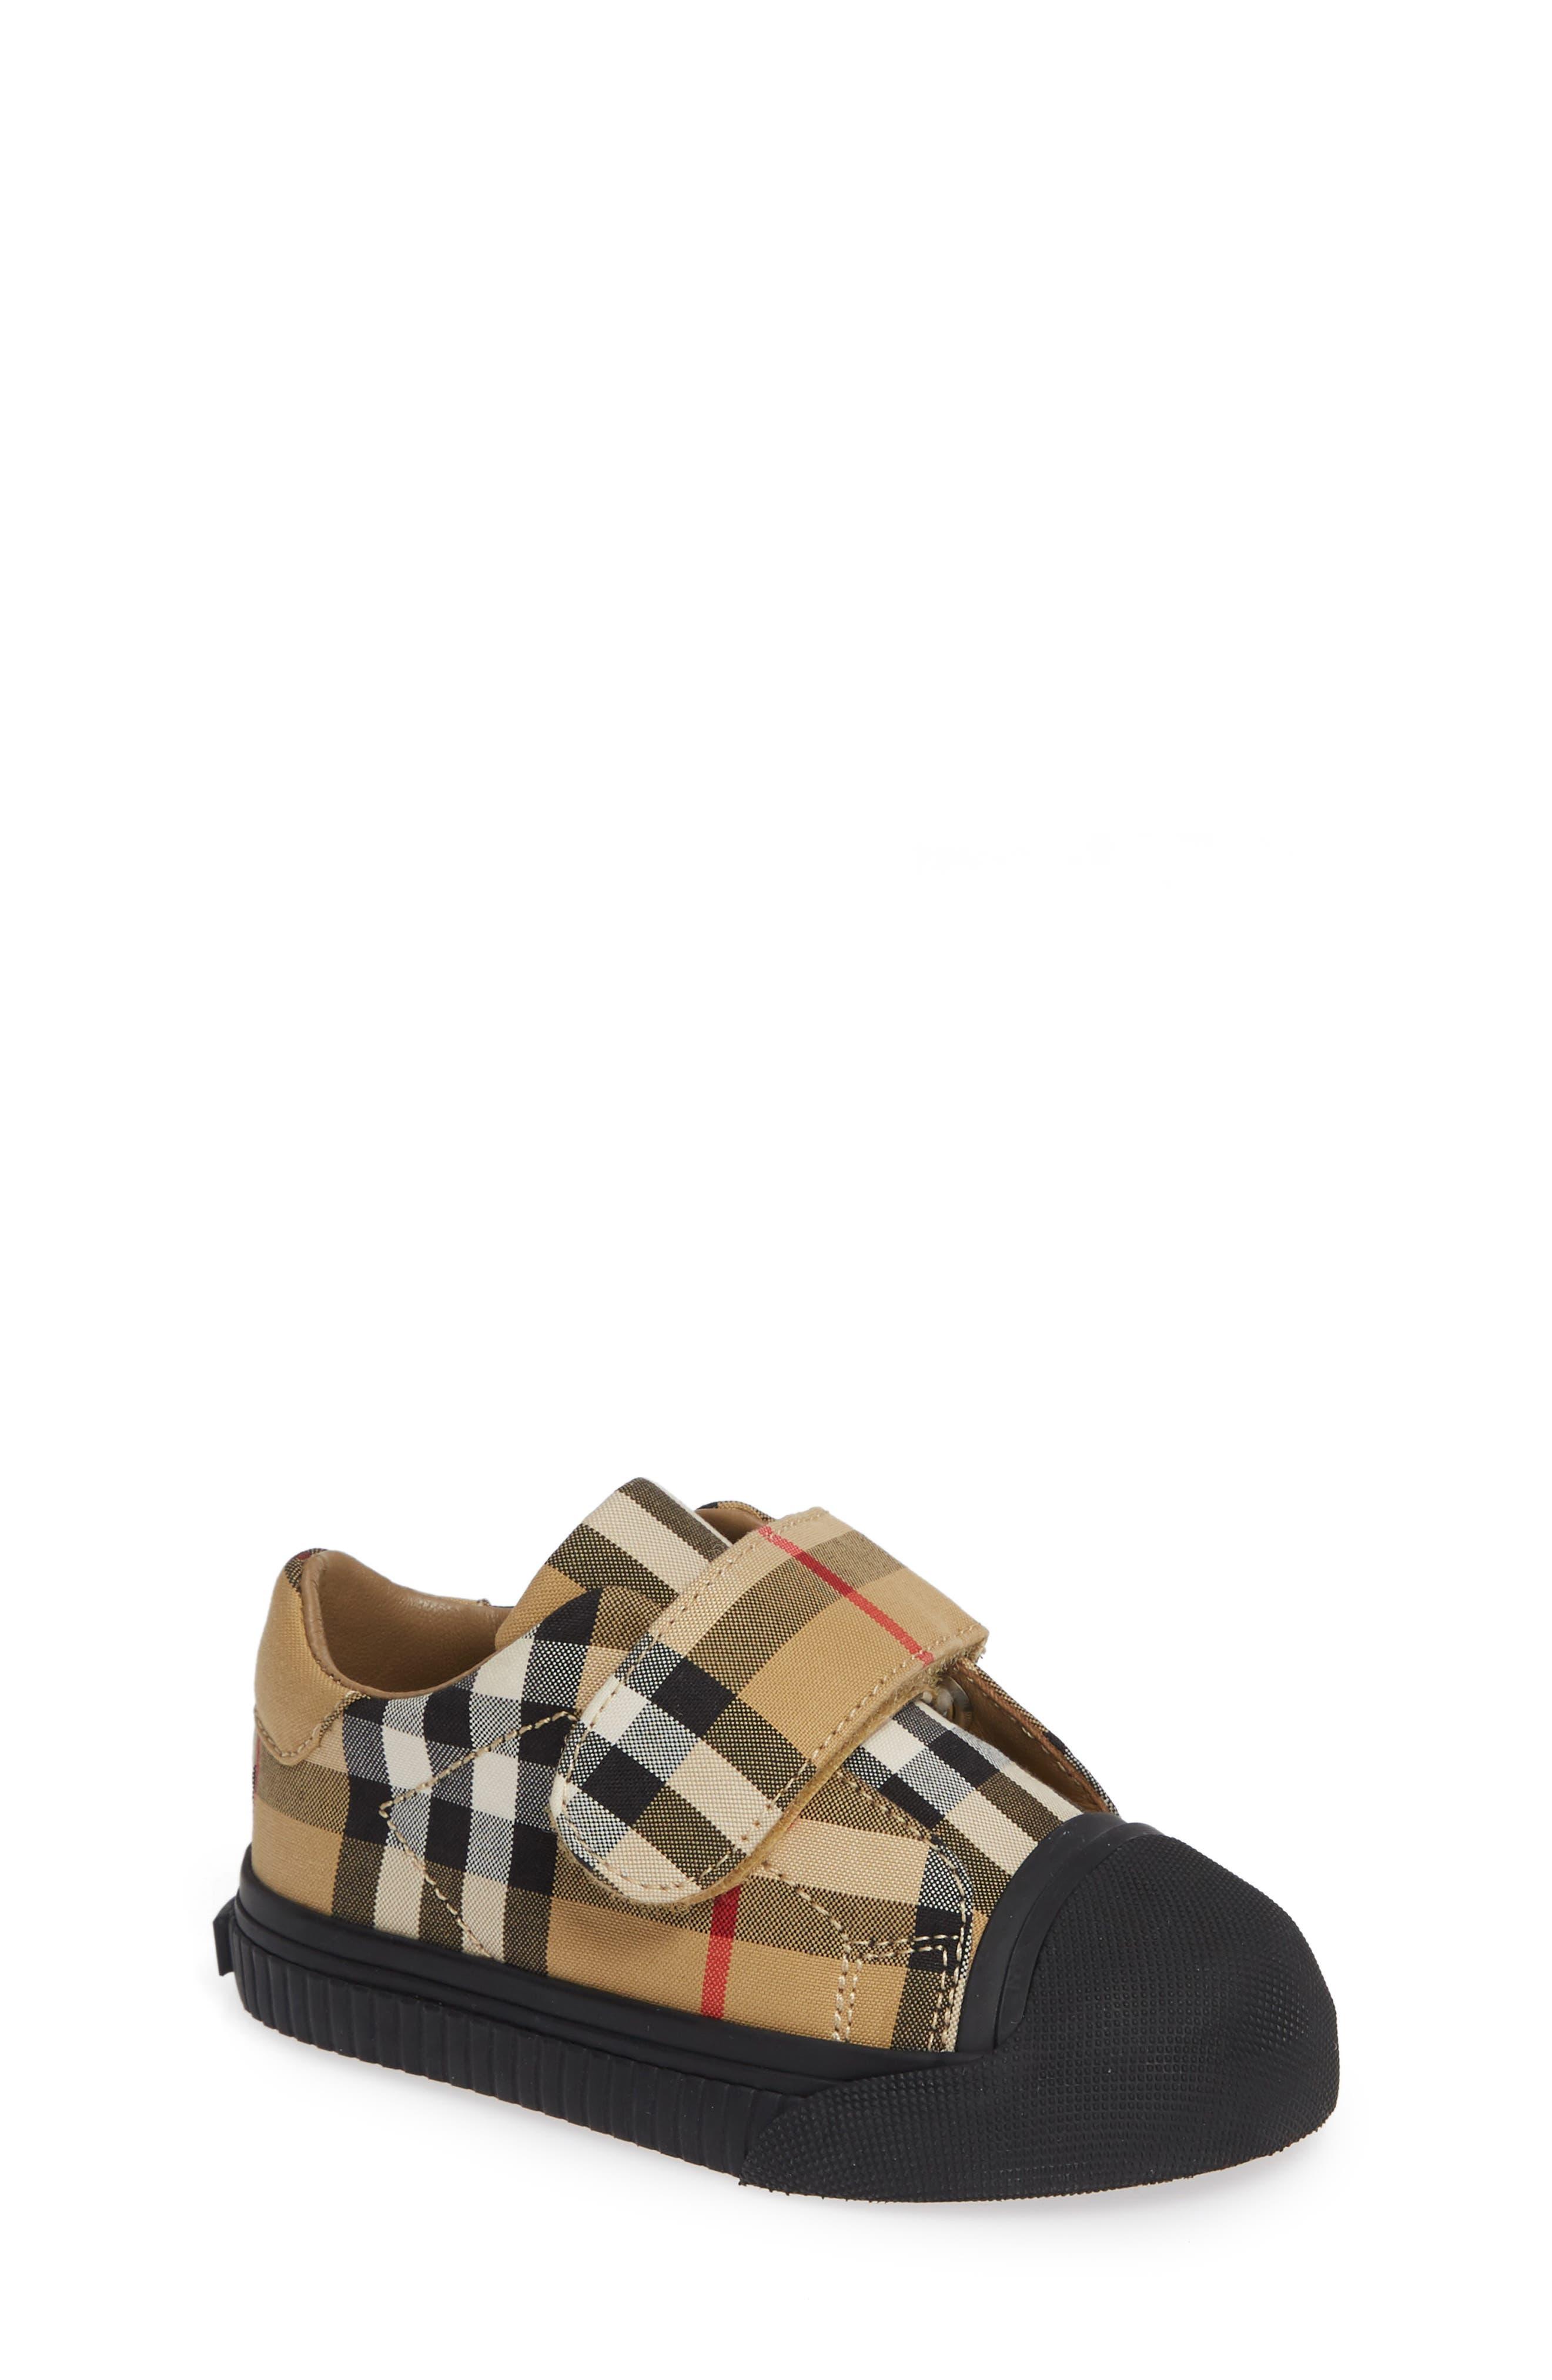 Beech Check Sneaker,                             Main thumbnail 1, color,                             001